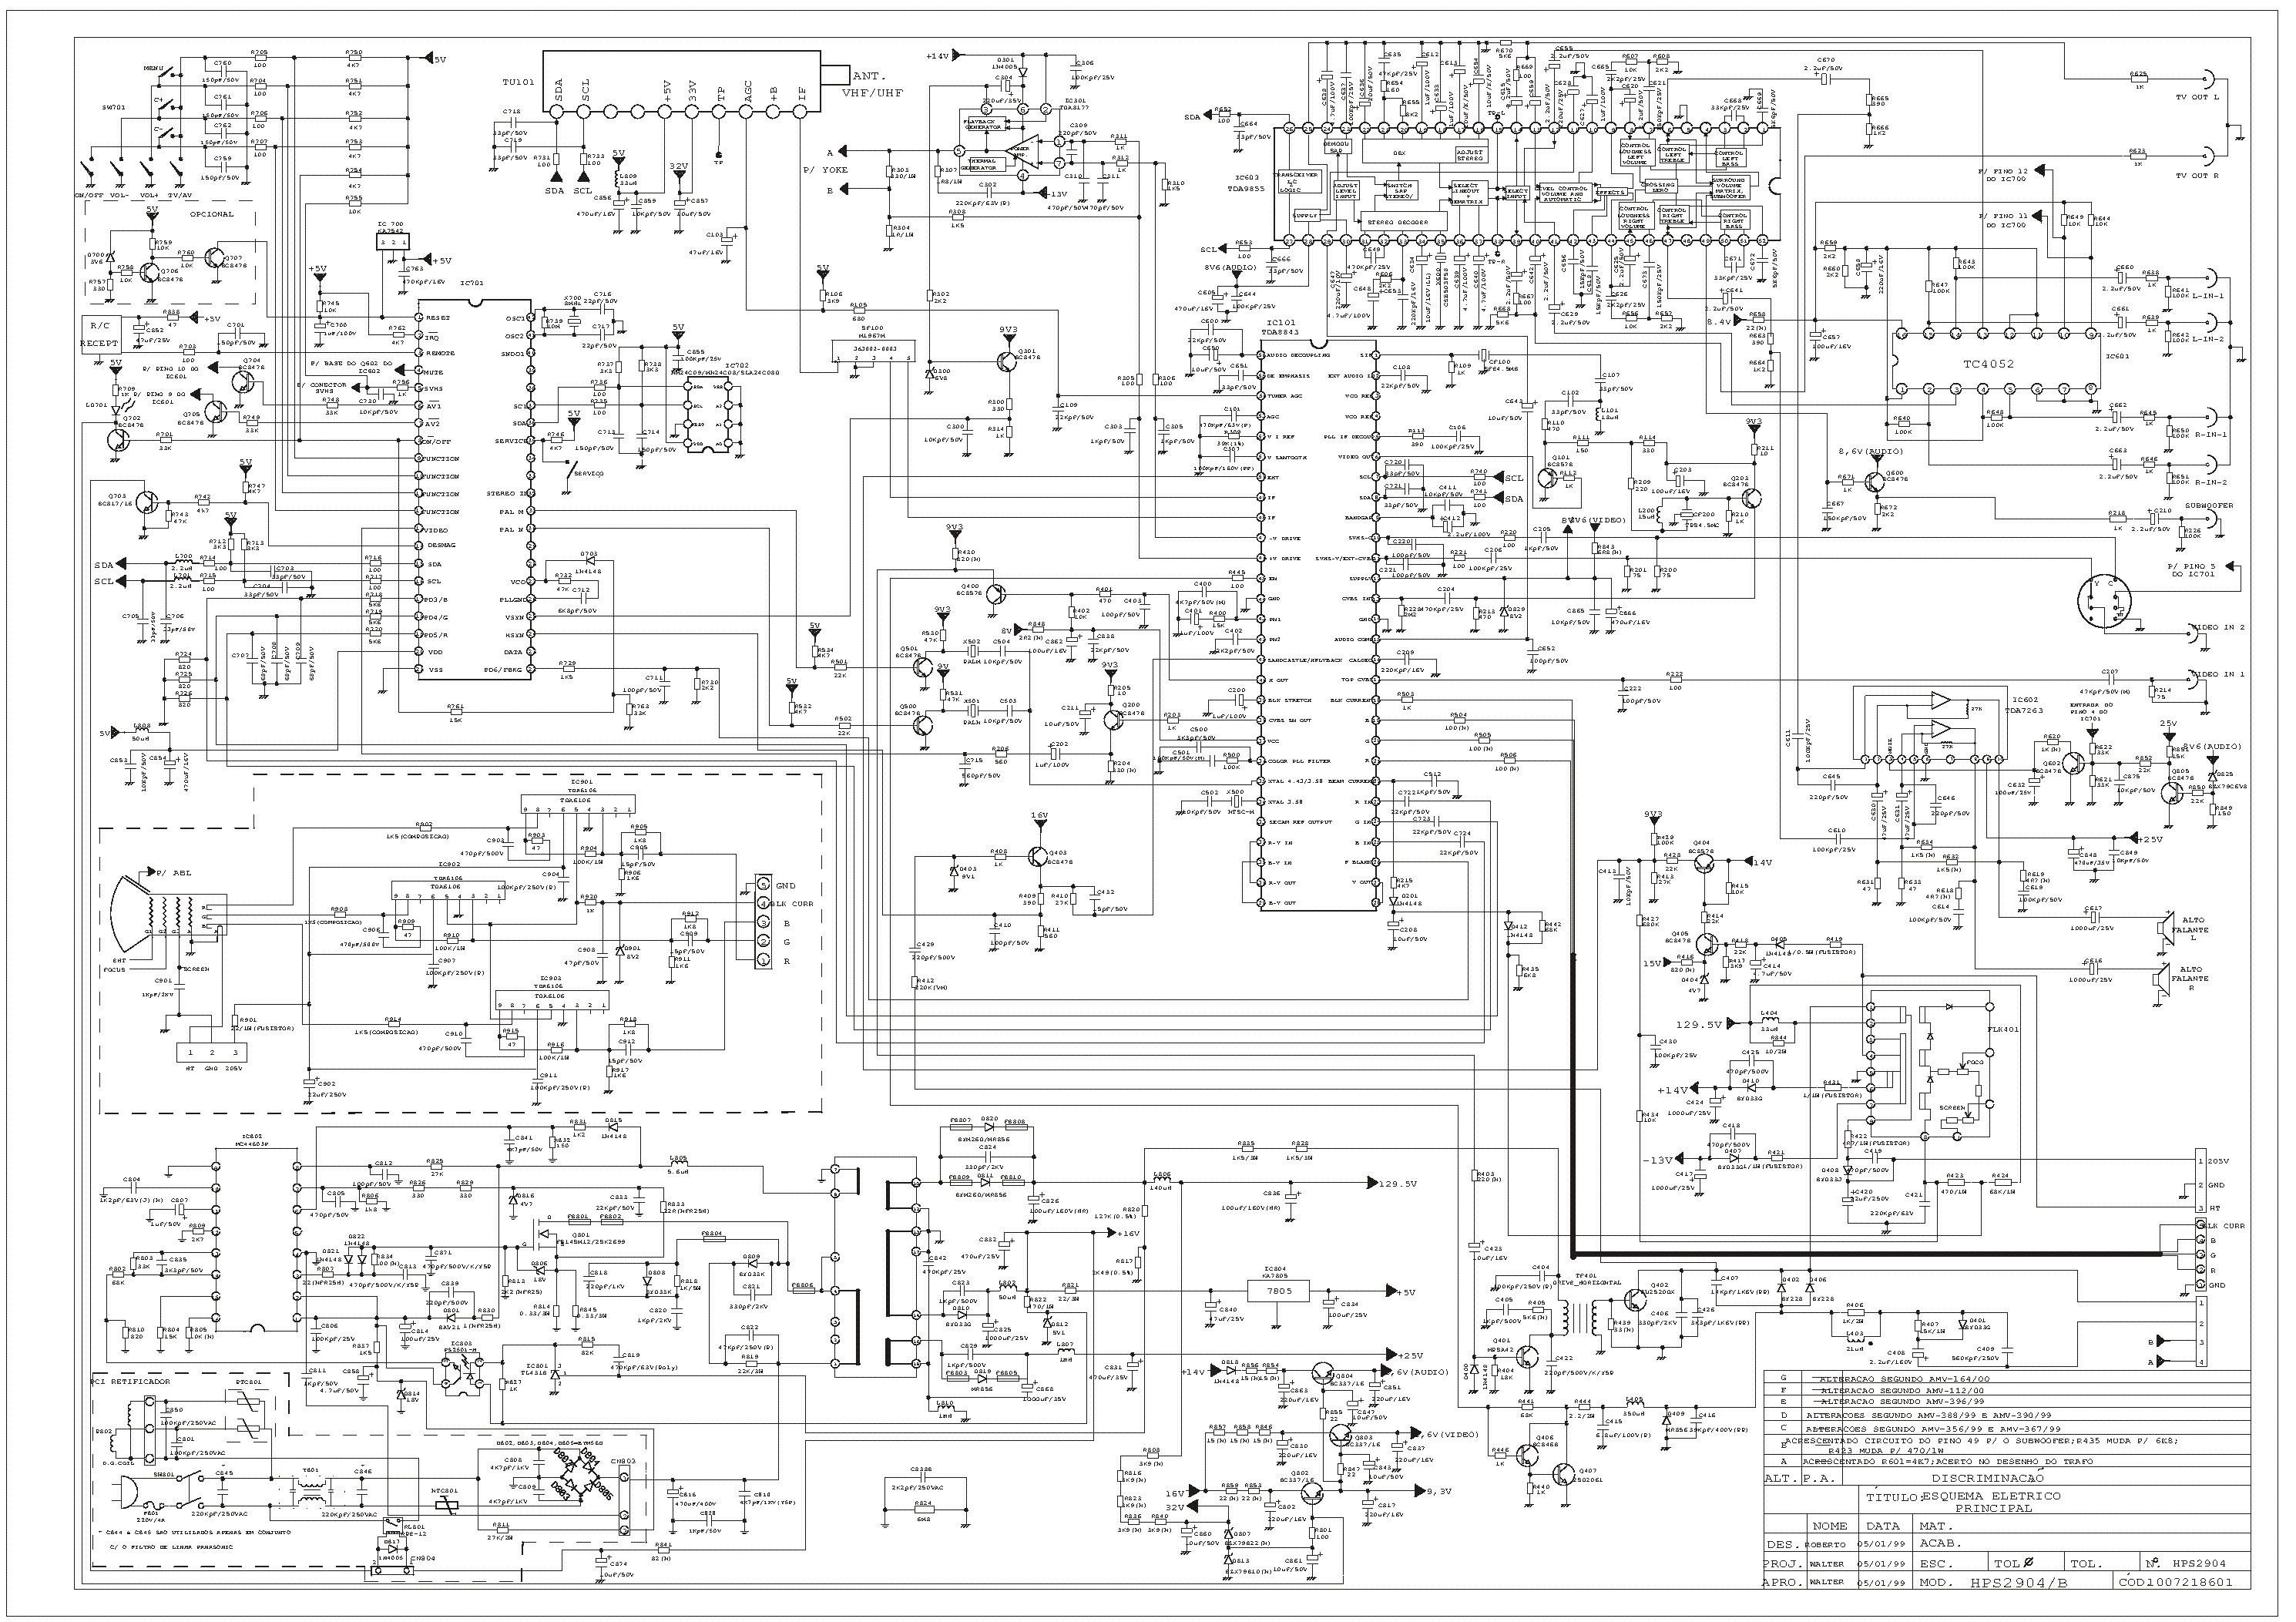 CCE HPS-2904,B service manual (1st page)